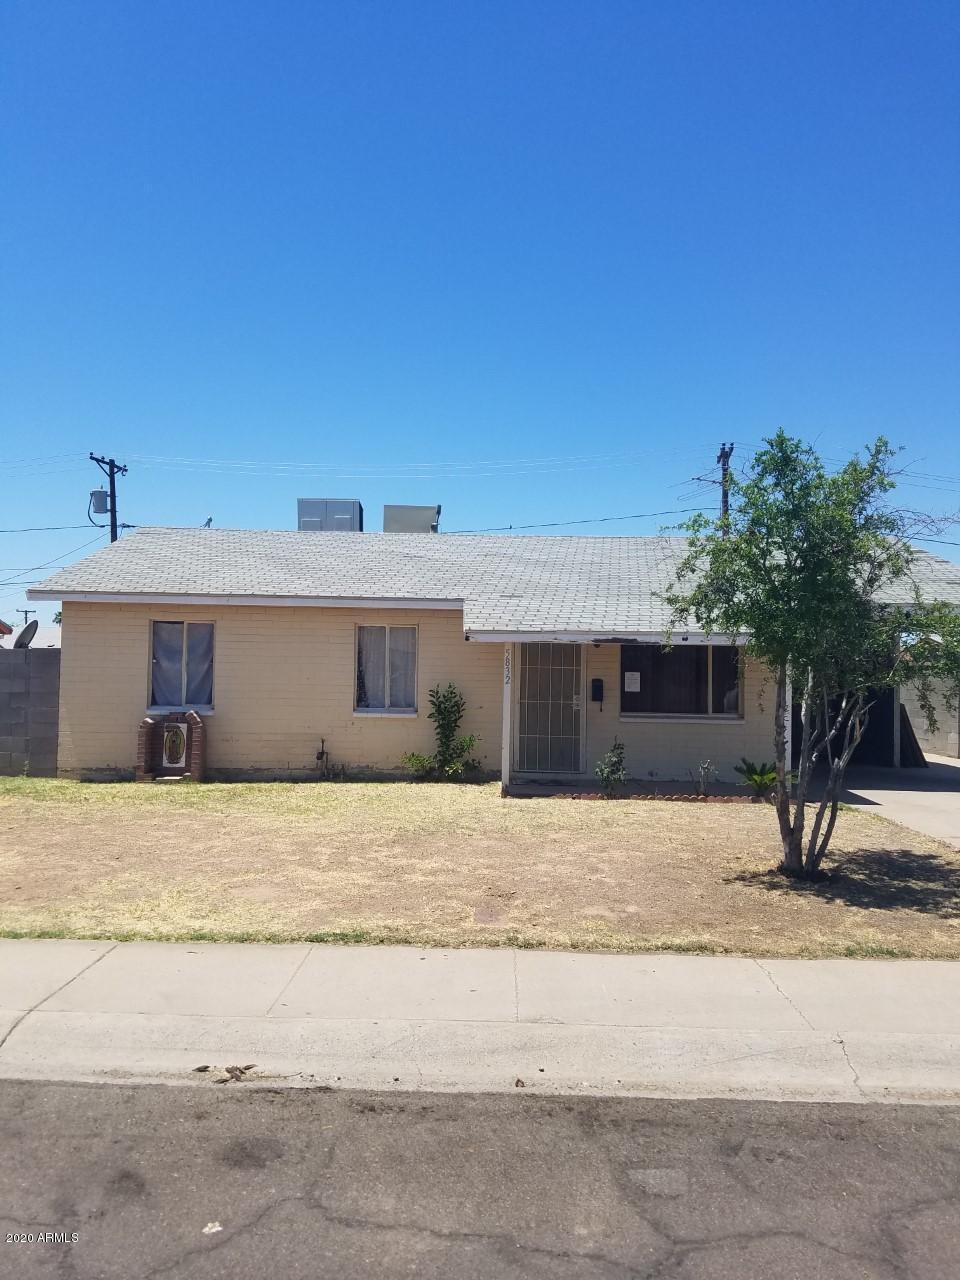 Photo of 5832 N 64TH Avenue, Glendale, AZ 85301